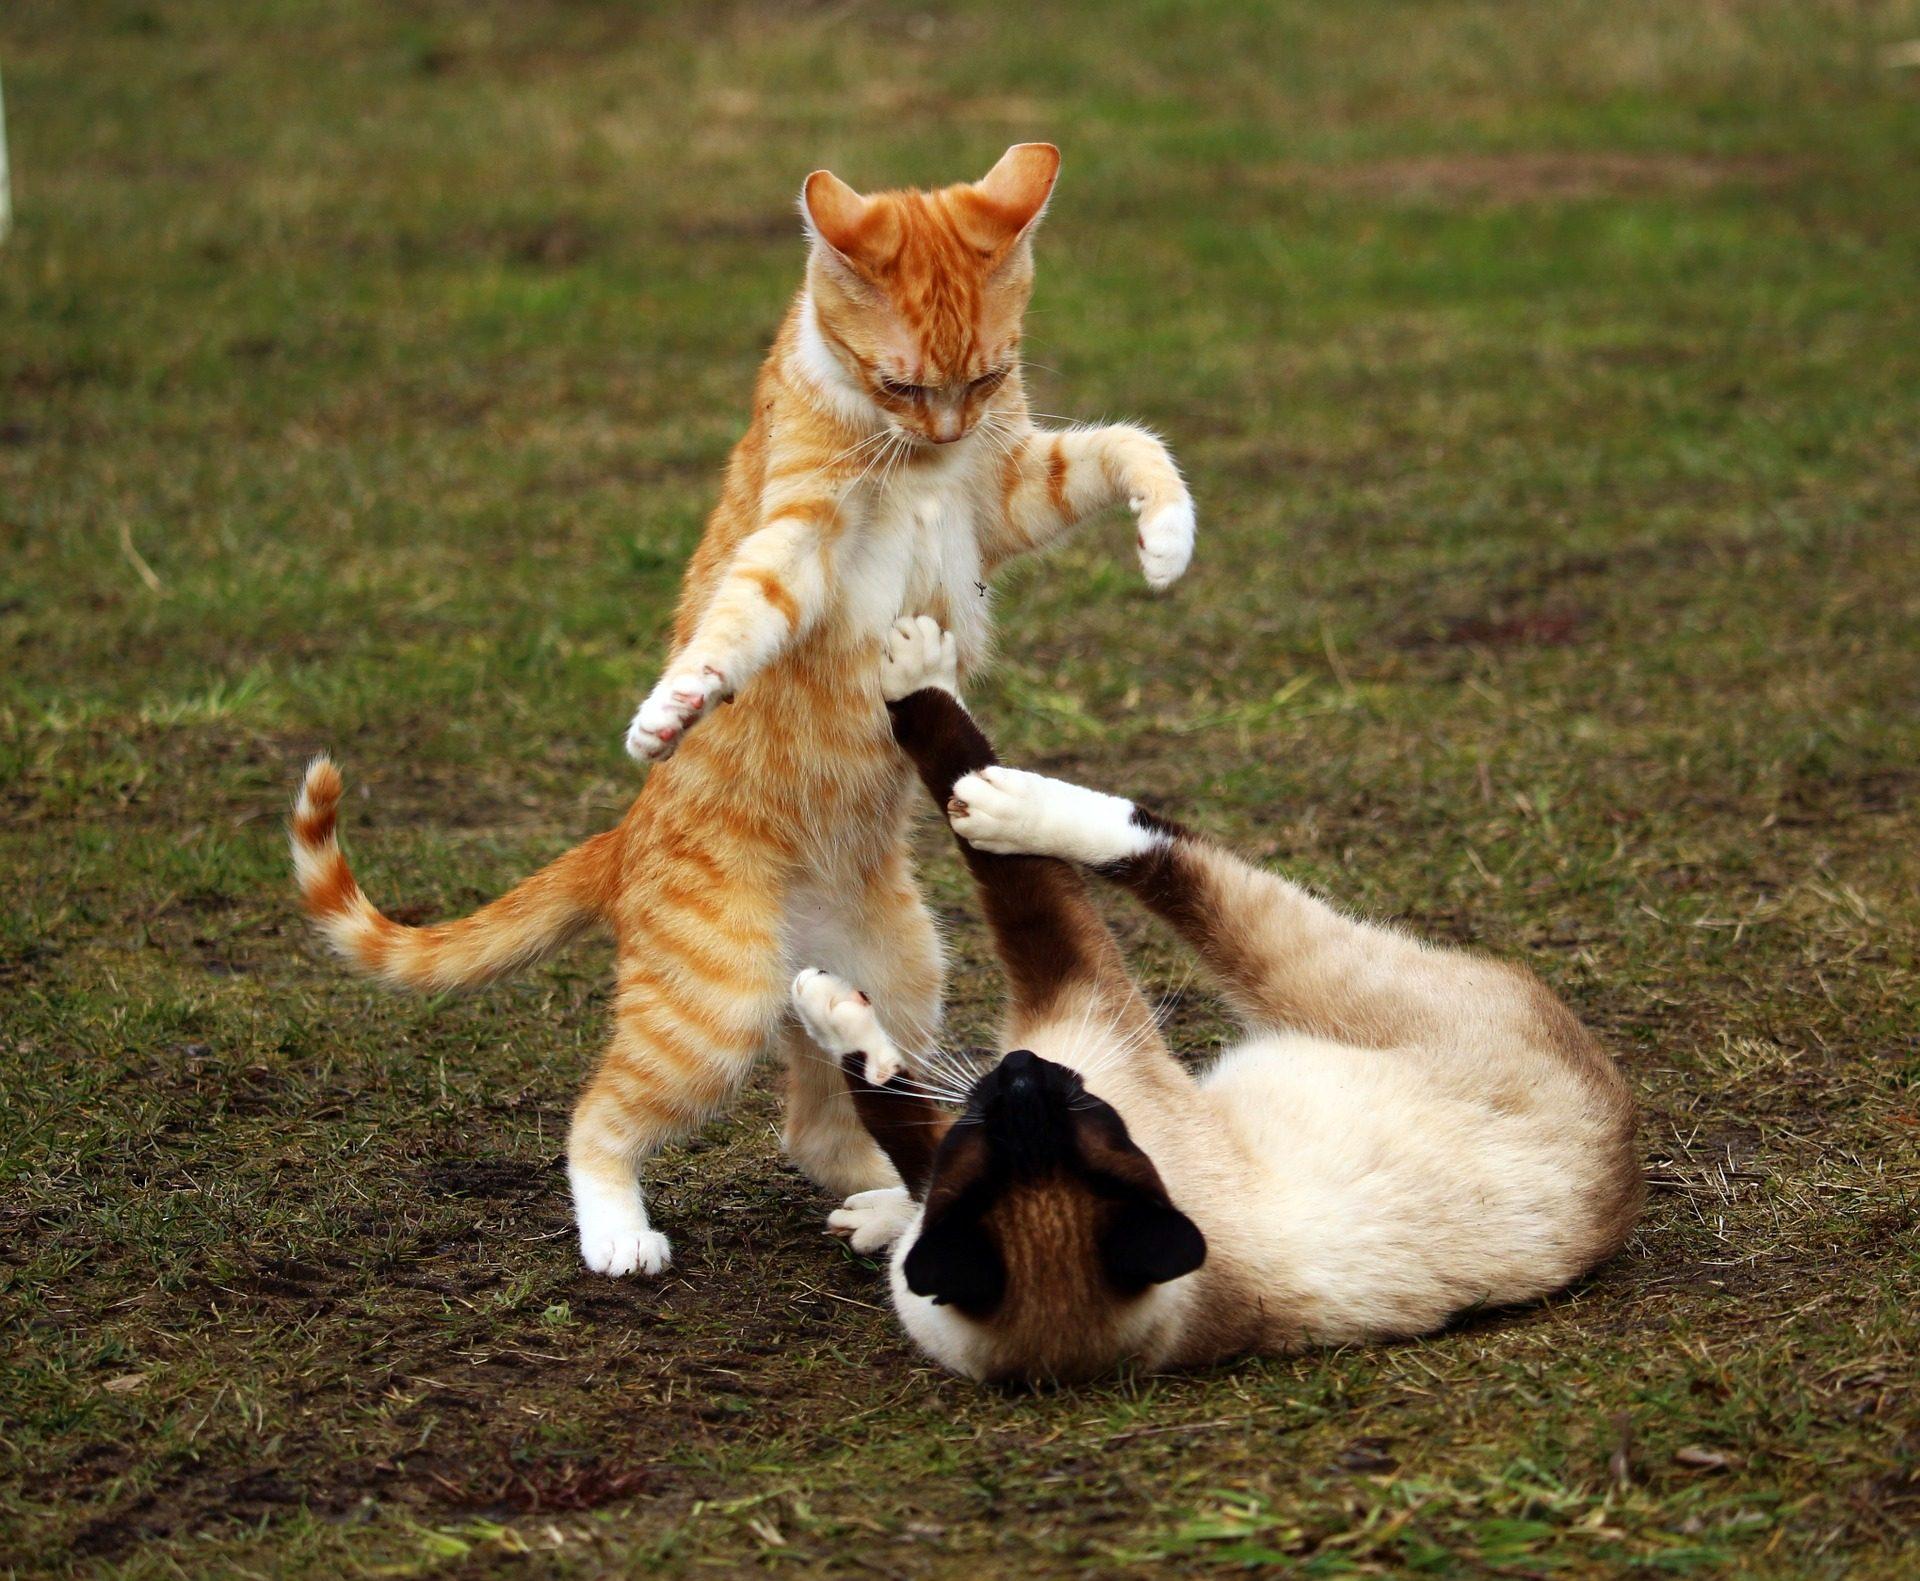 gatos, juego, pelea, jardín, mascotas, siamés - Fondos de Pantalla HD - professor-falken.com